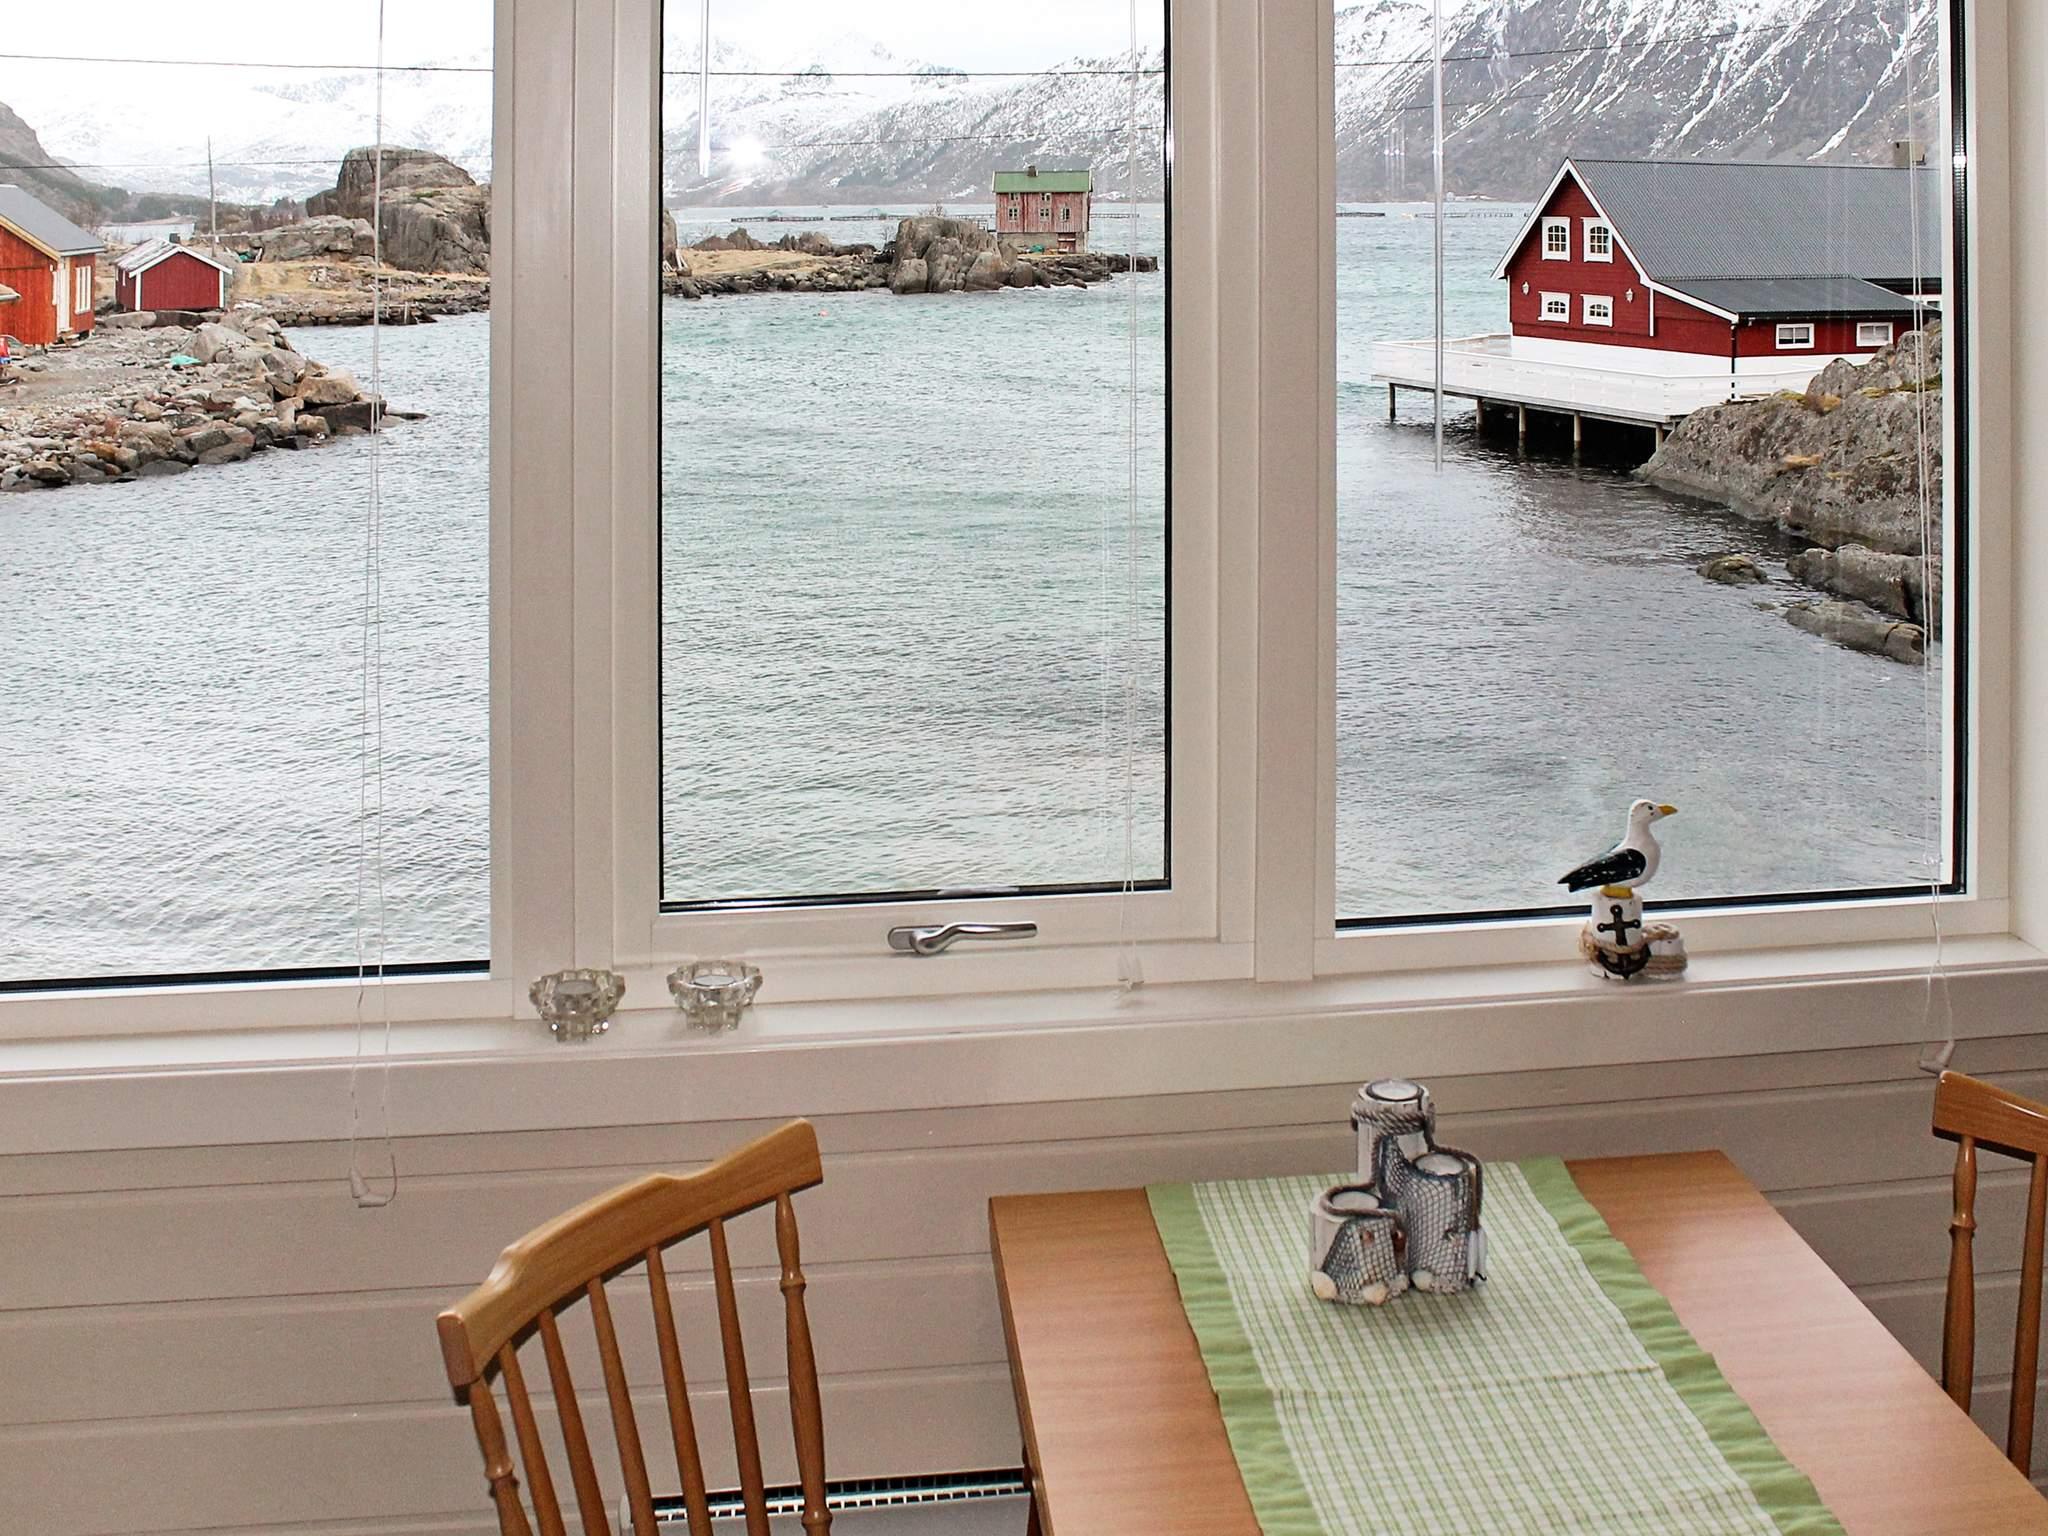 Ferienhaus Lofoten (439553), Sennesvik, , Nordnorwegen, Norwegen, Bild 12